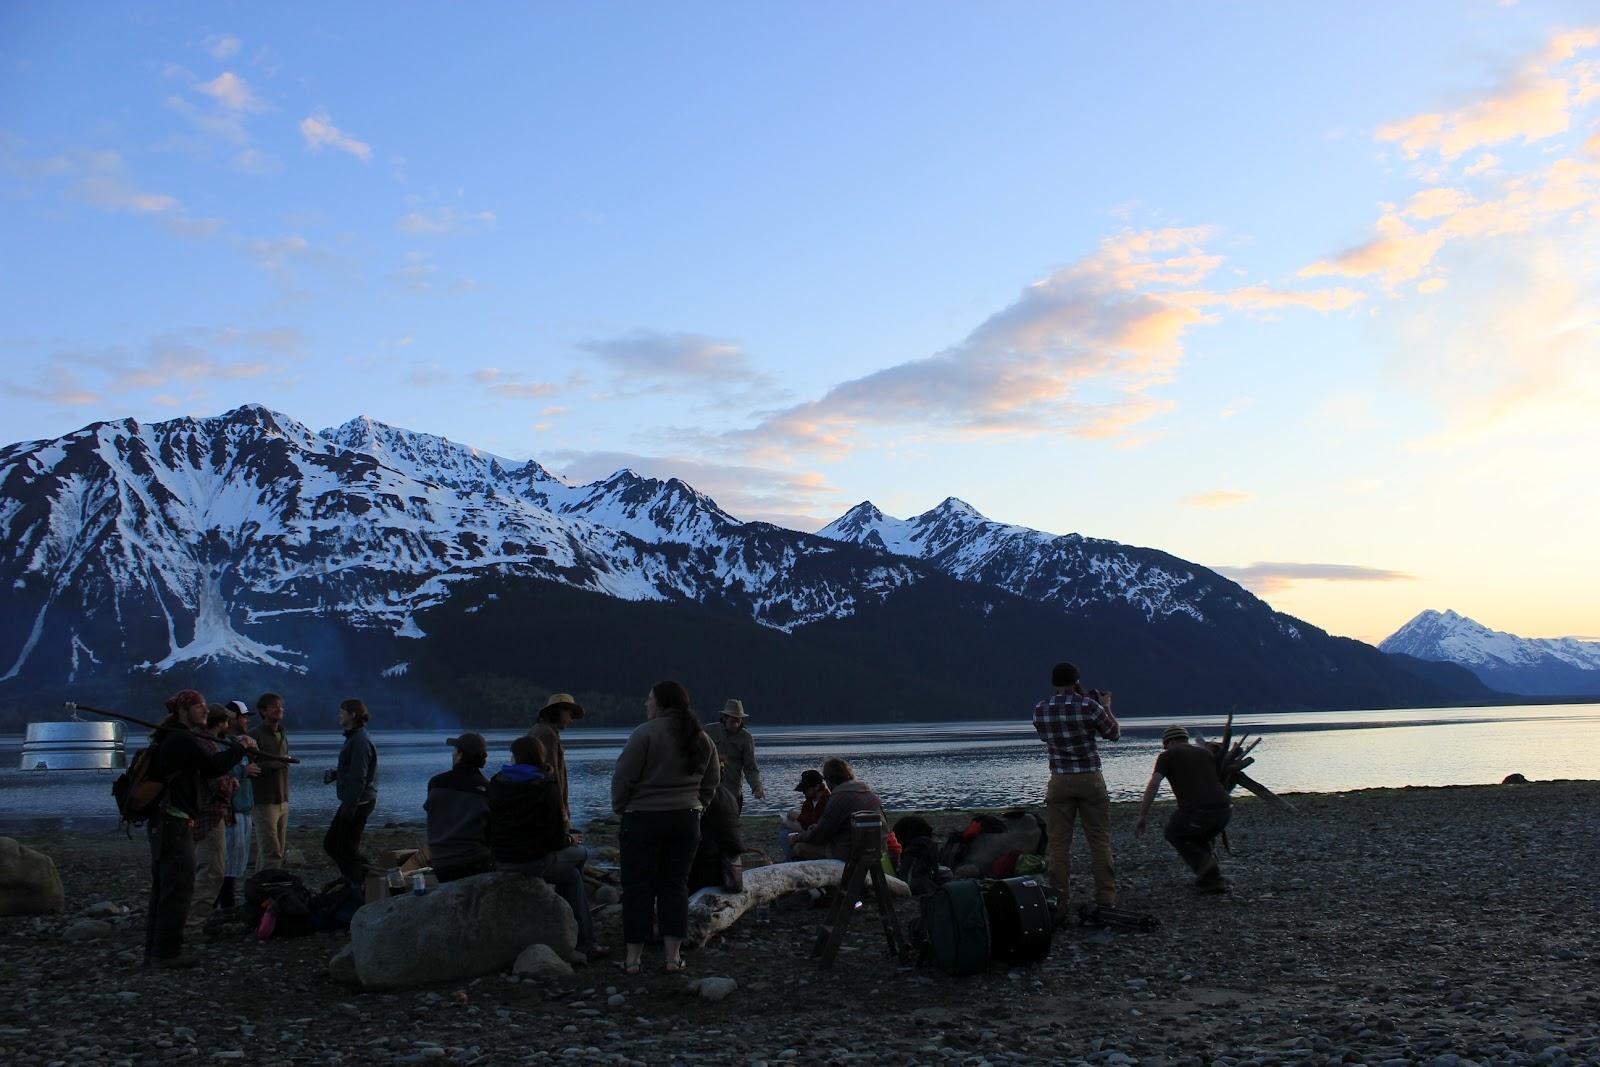 img_9716-jpg.46776_Preparing for Winter in Alaska :: Rose Hips :: Dried Seaweed_Wilderness Survival_Squat the Planet_3:33 PM